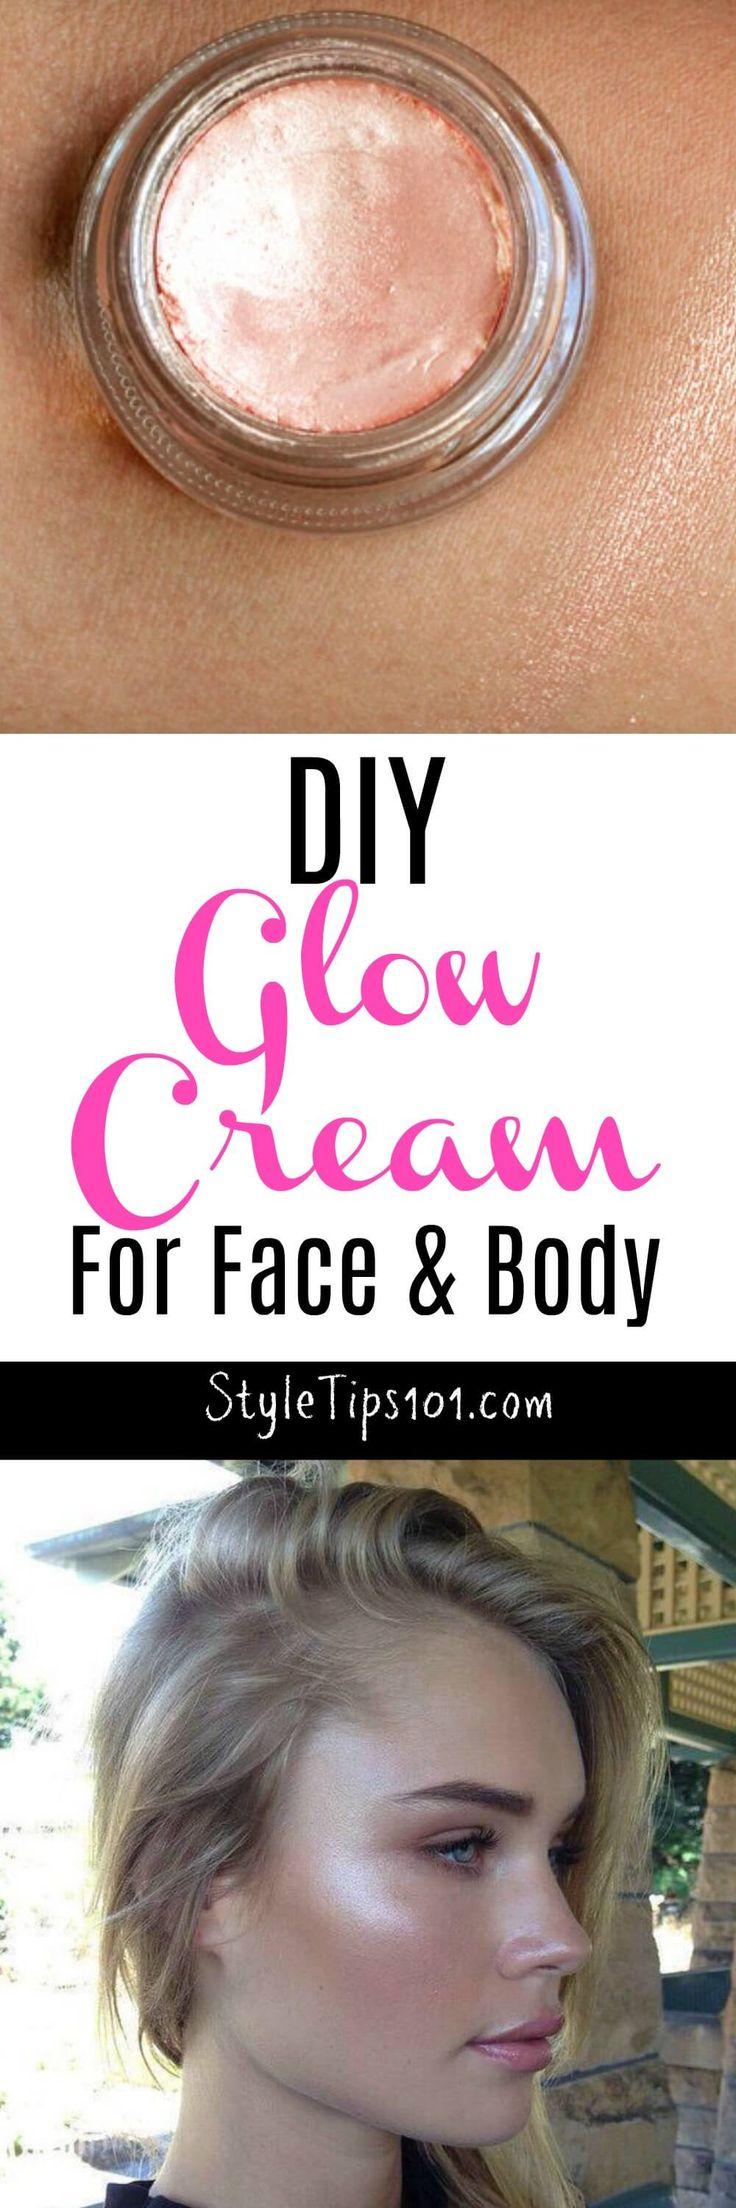 DIY Glow Cream